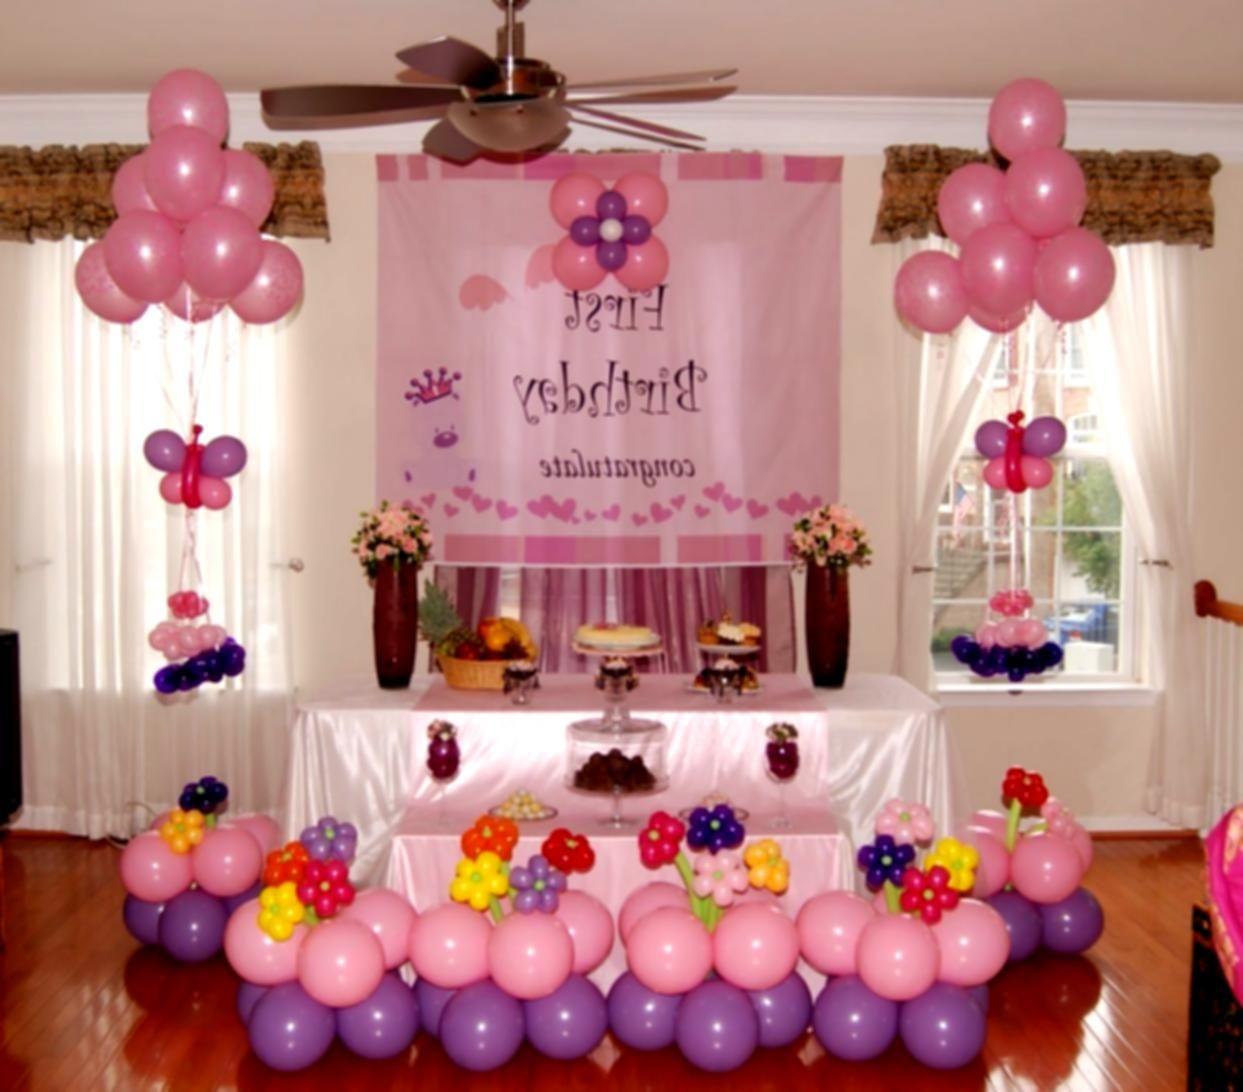 Birthday Party Decoration Ideas Birthday Decorations At Home First Birthday Decorations 1st Birthday Party Decorations,How To Make Home Decoration